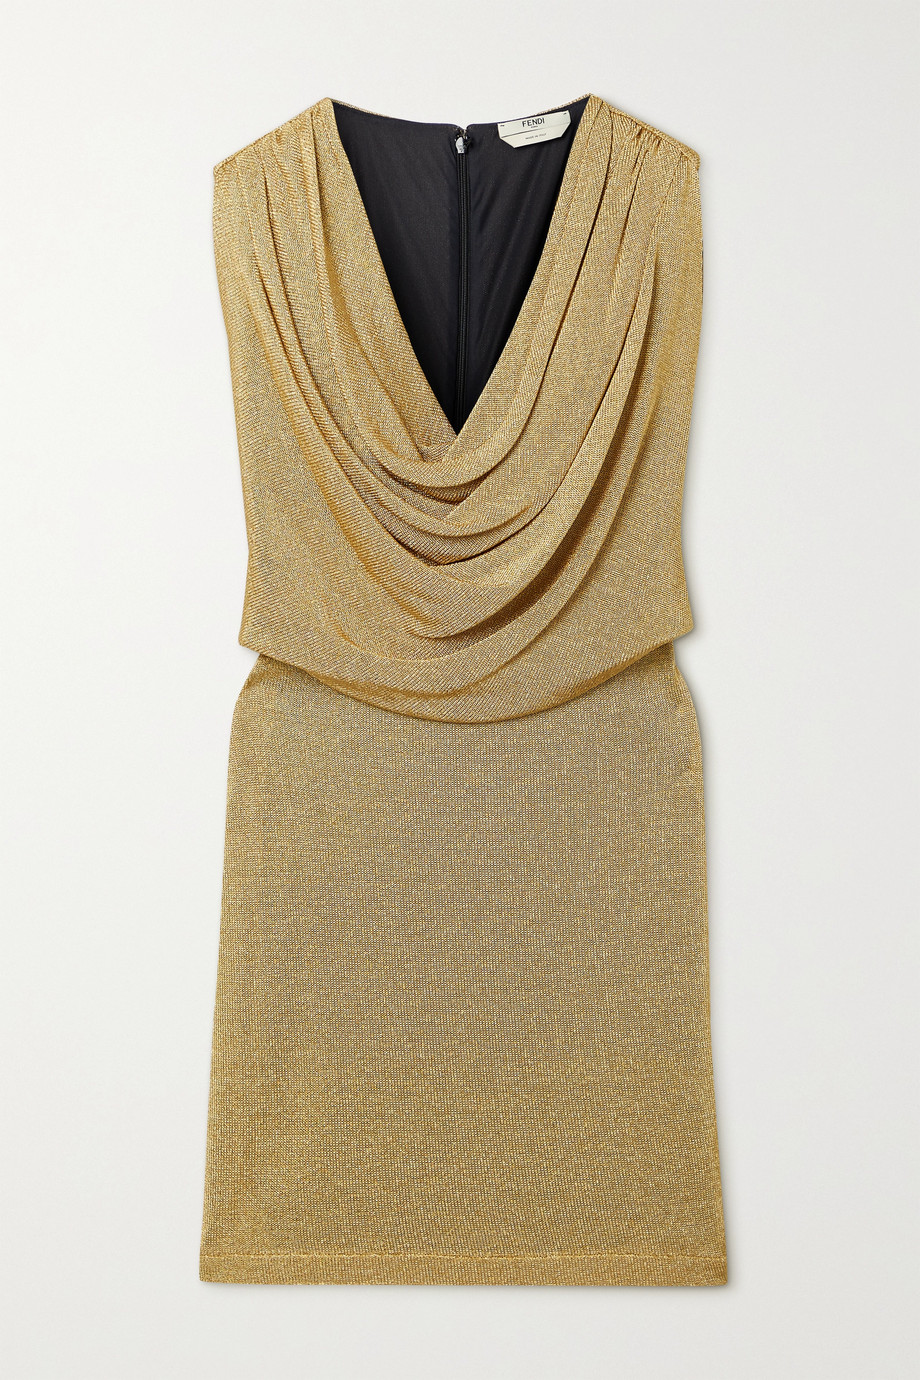 Fendi Draped metallic knitted mini dress